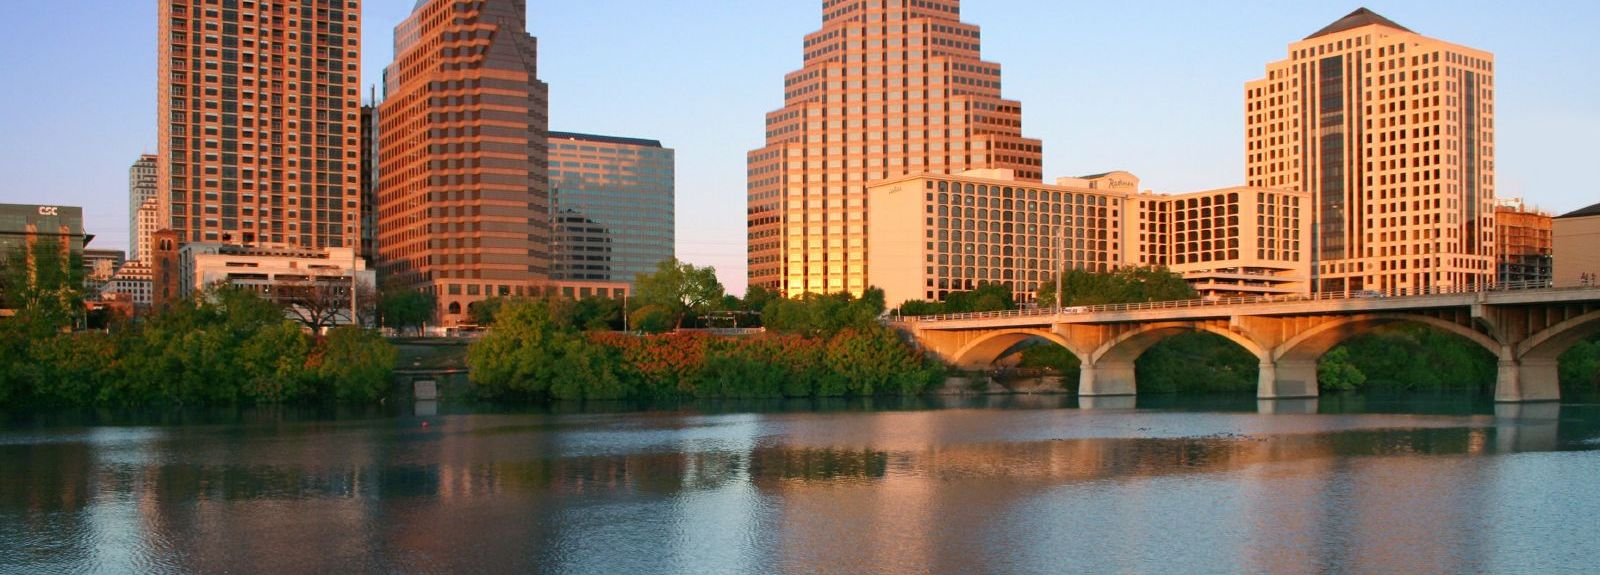 Rosedale, Austin, Texas, USA